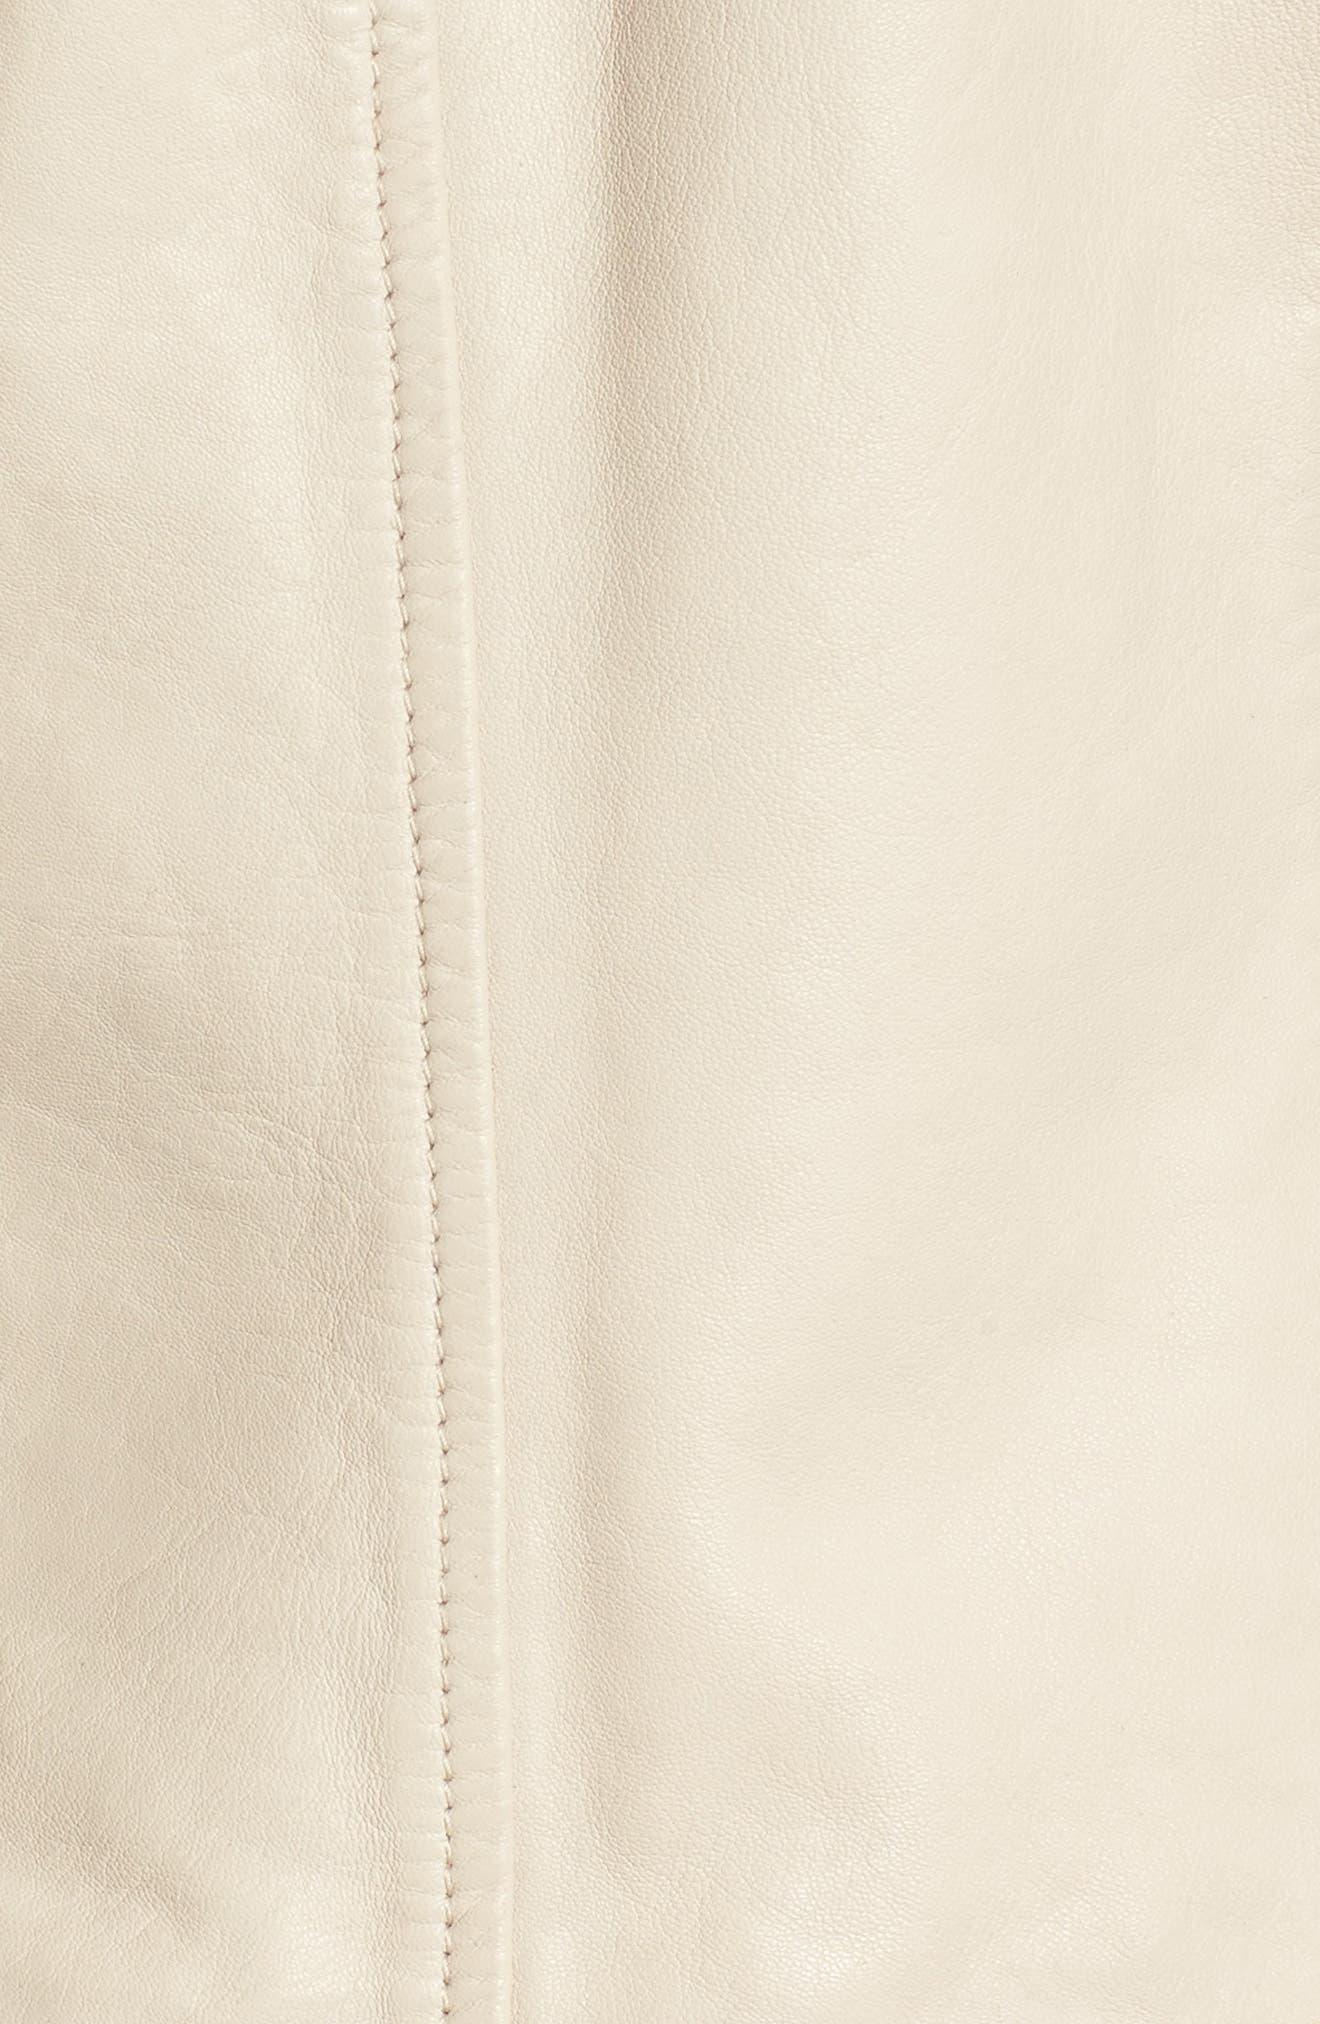 Moto Zip Leather Jacket,                             Alternate thumbnail 5, color,                             Champagne